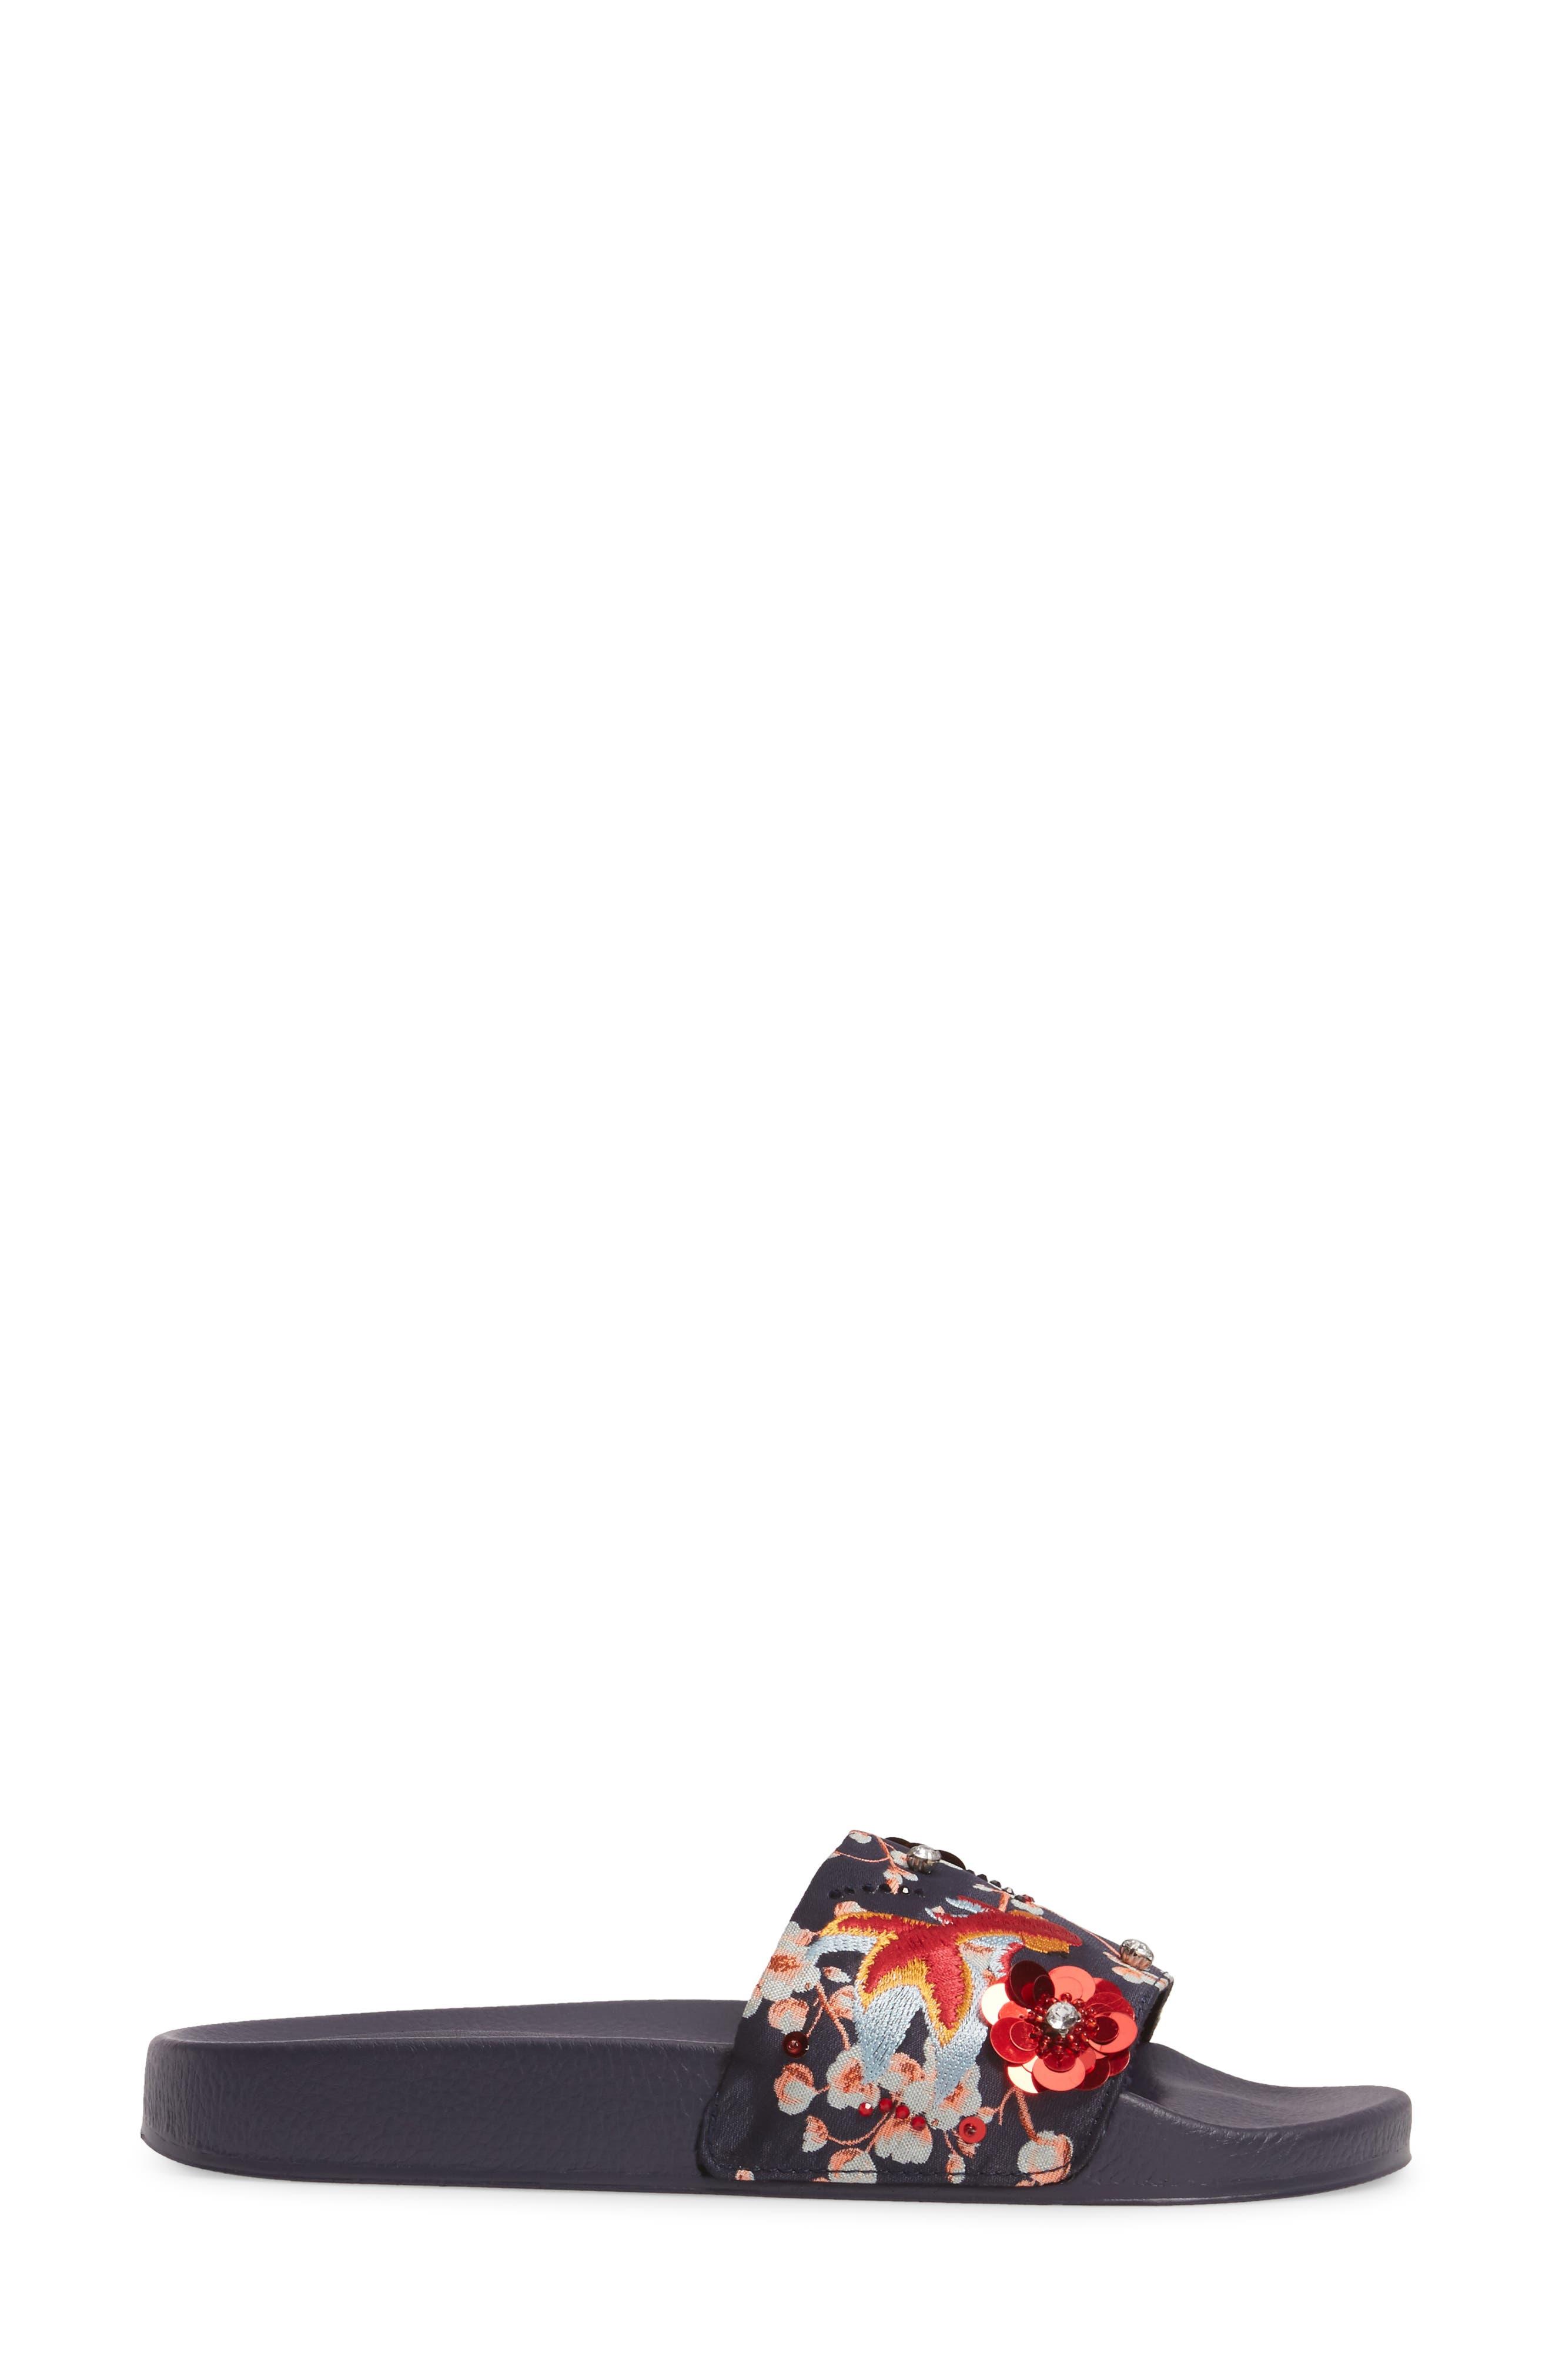 HERRING Goldfish Embellished Slide Sandal,                             Alternate thumbnail 3, color,                             001